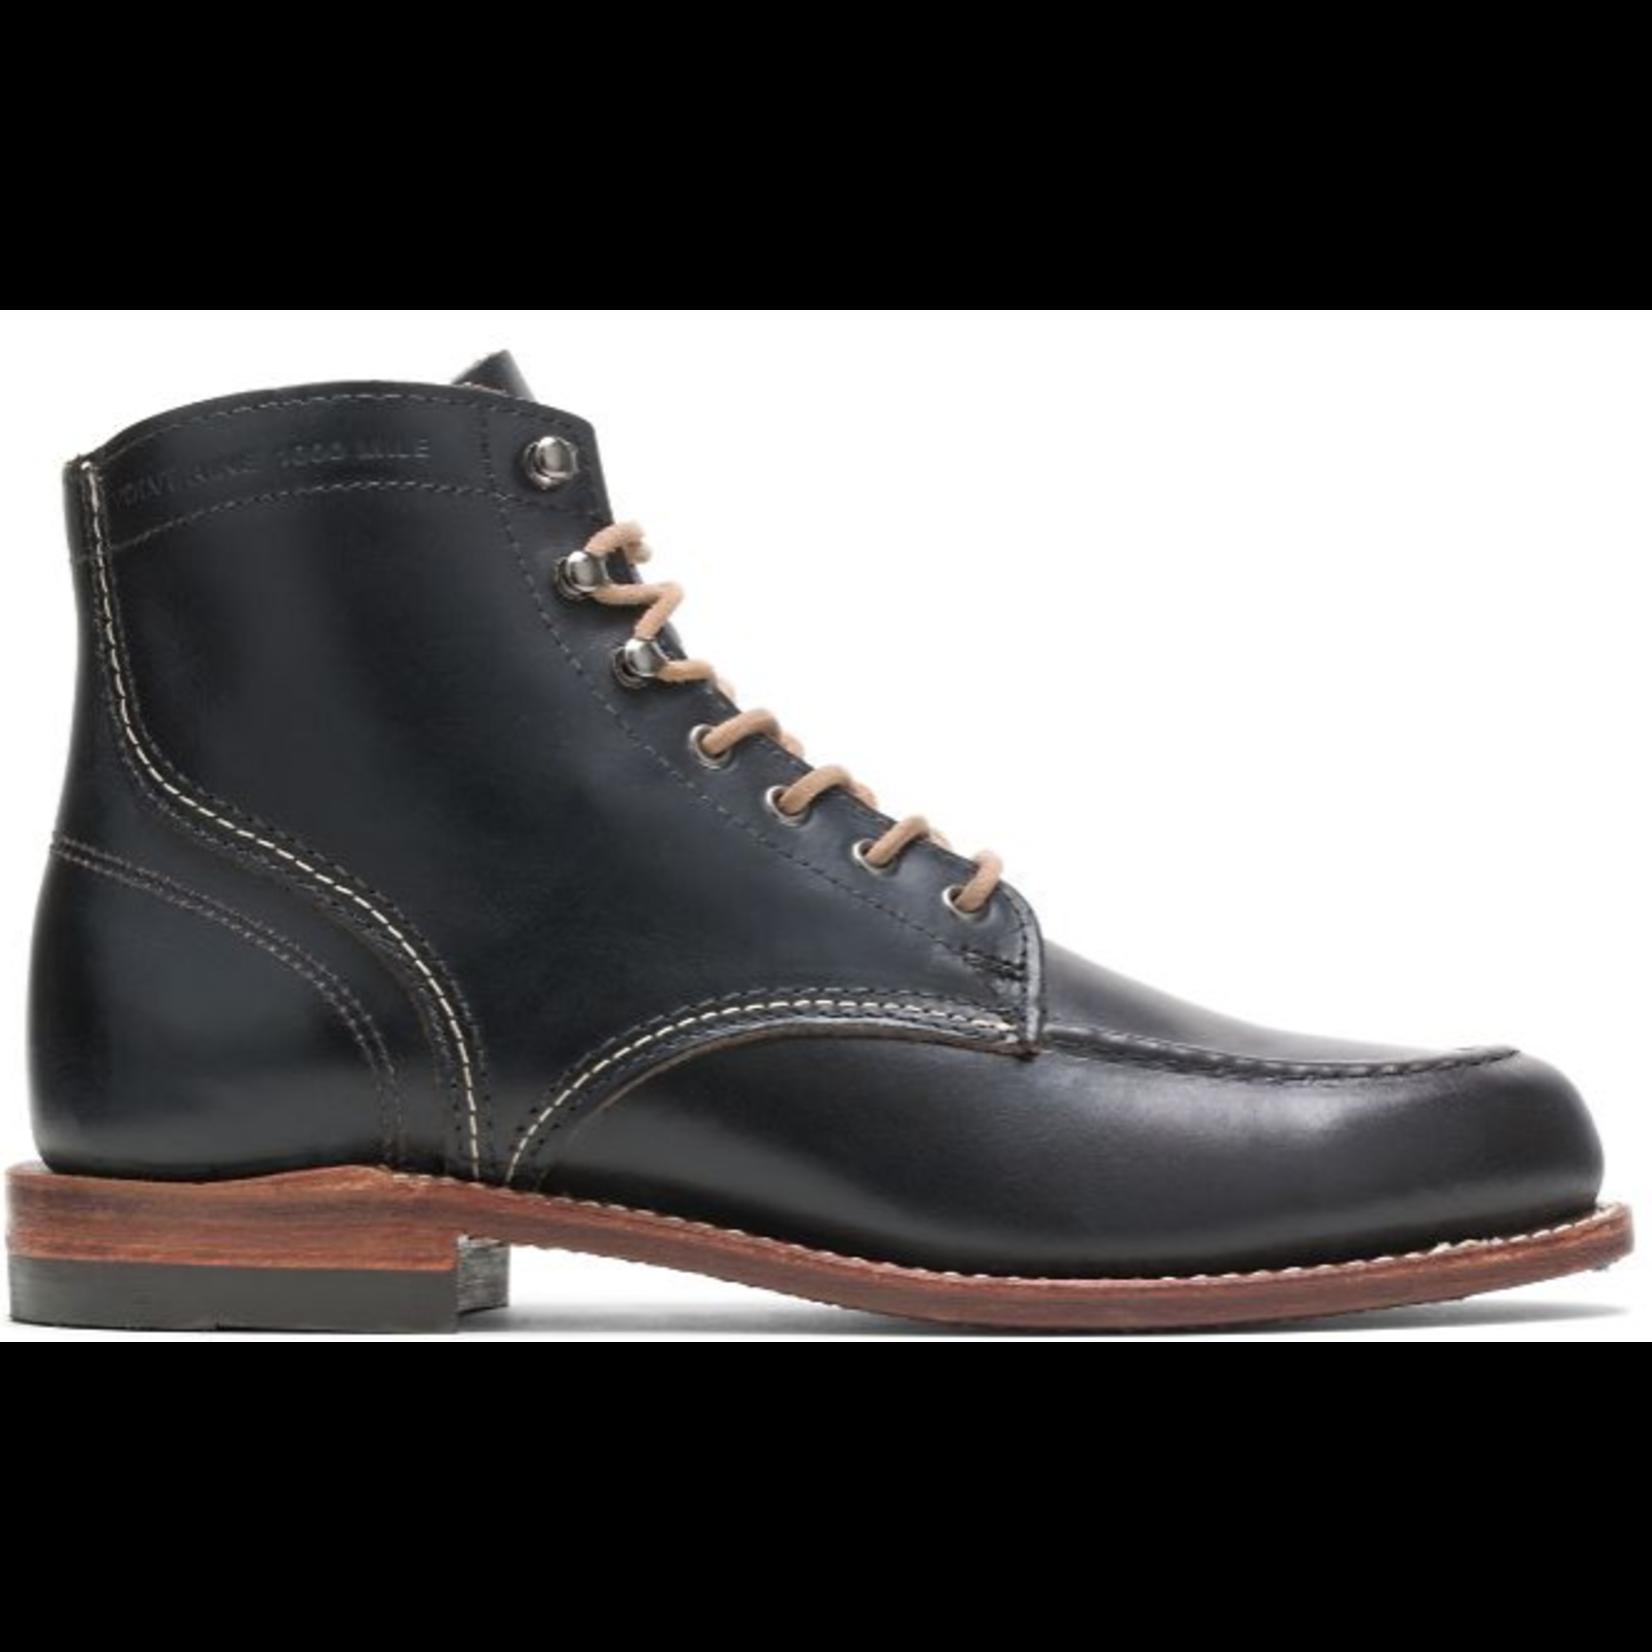 Men's Wolverine 1000 Mile 1940 Boot Black W40504